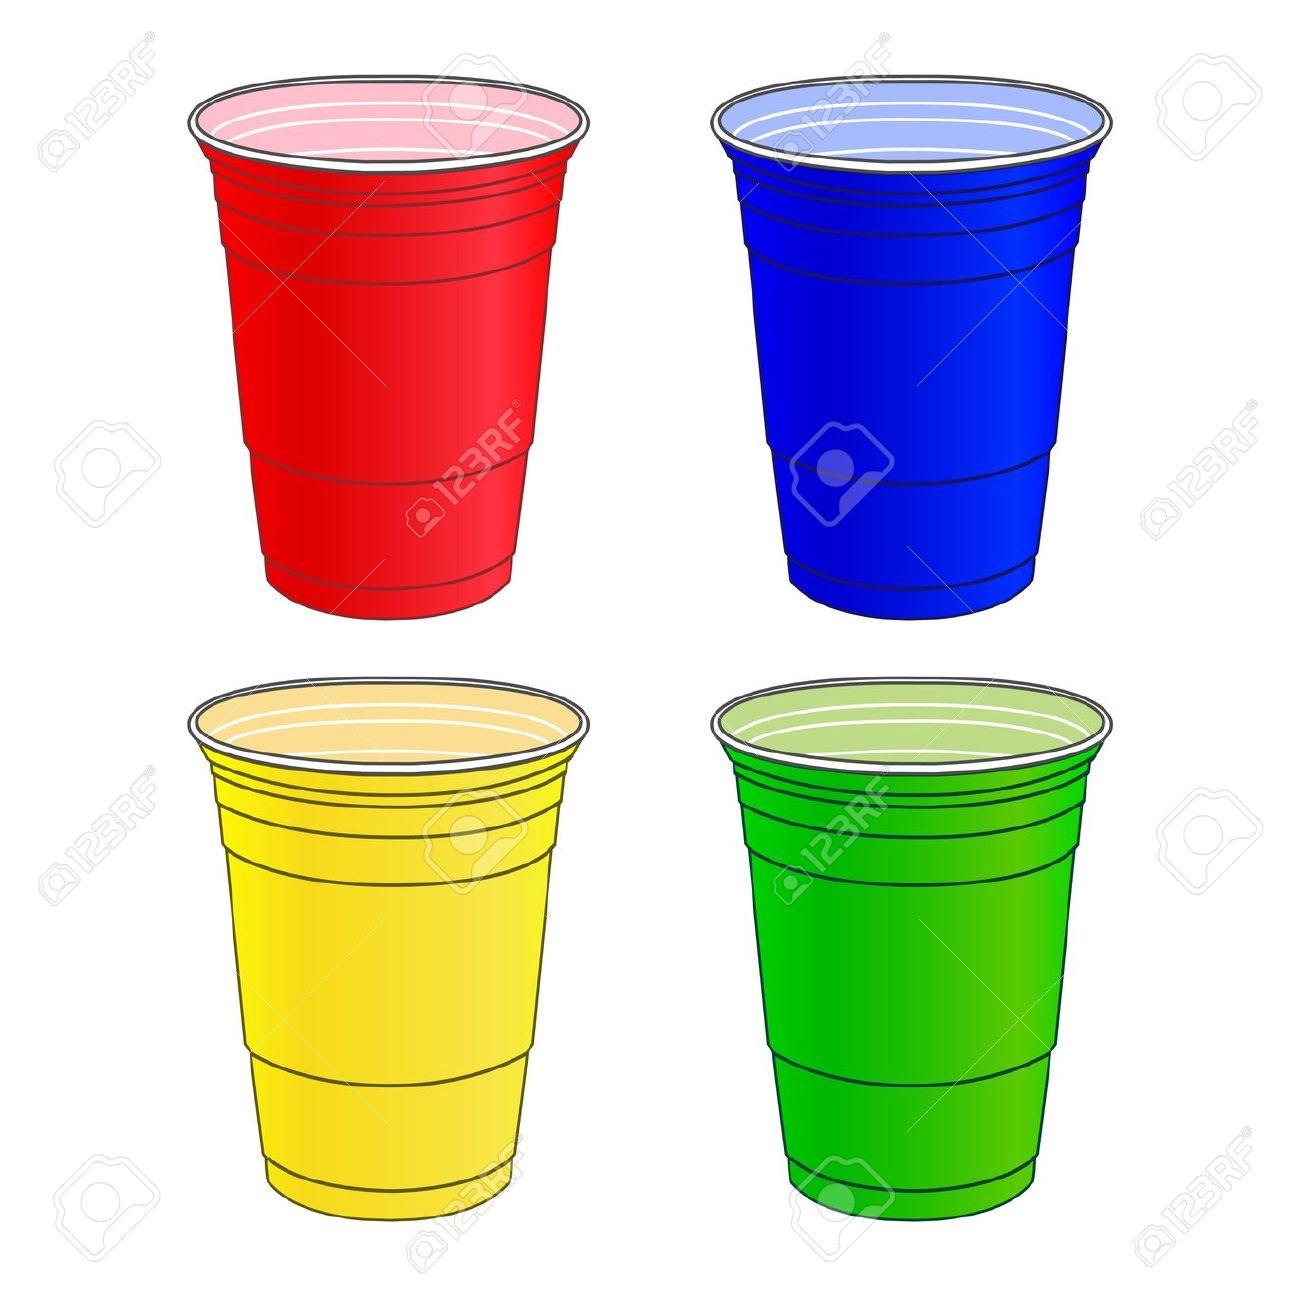 Plastic Cups Clipart.